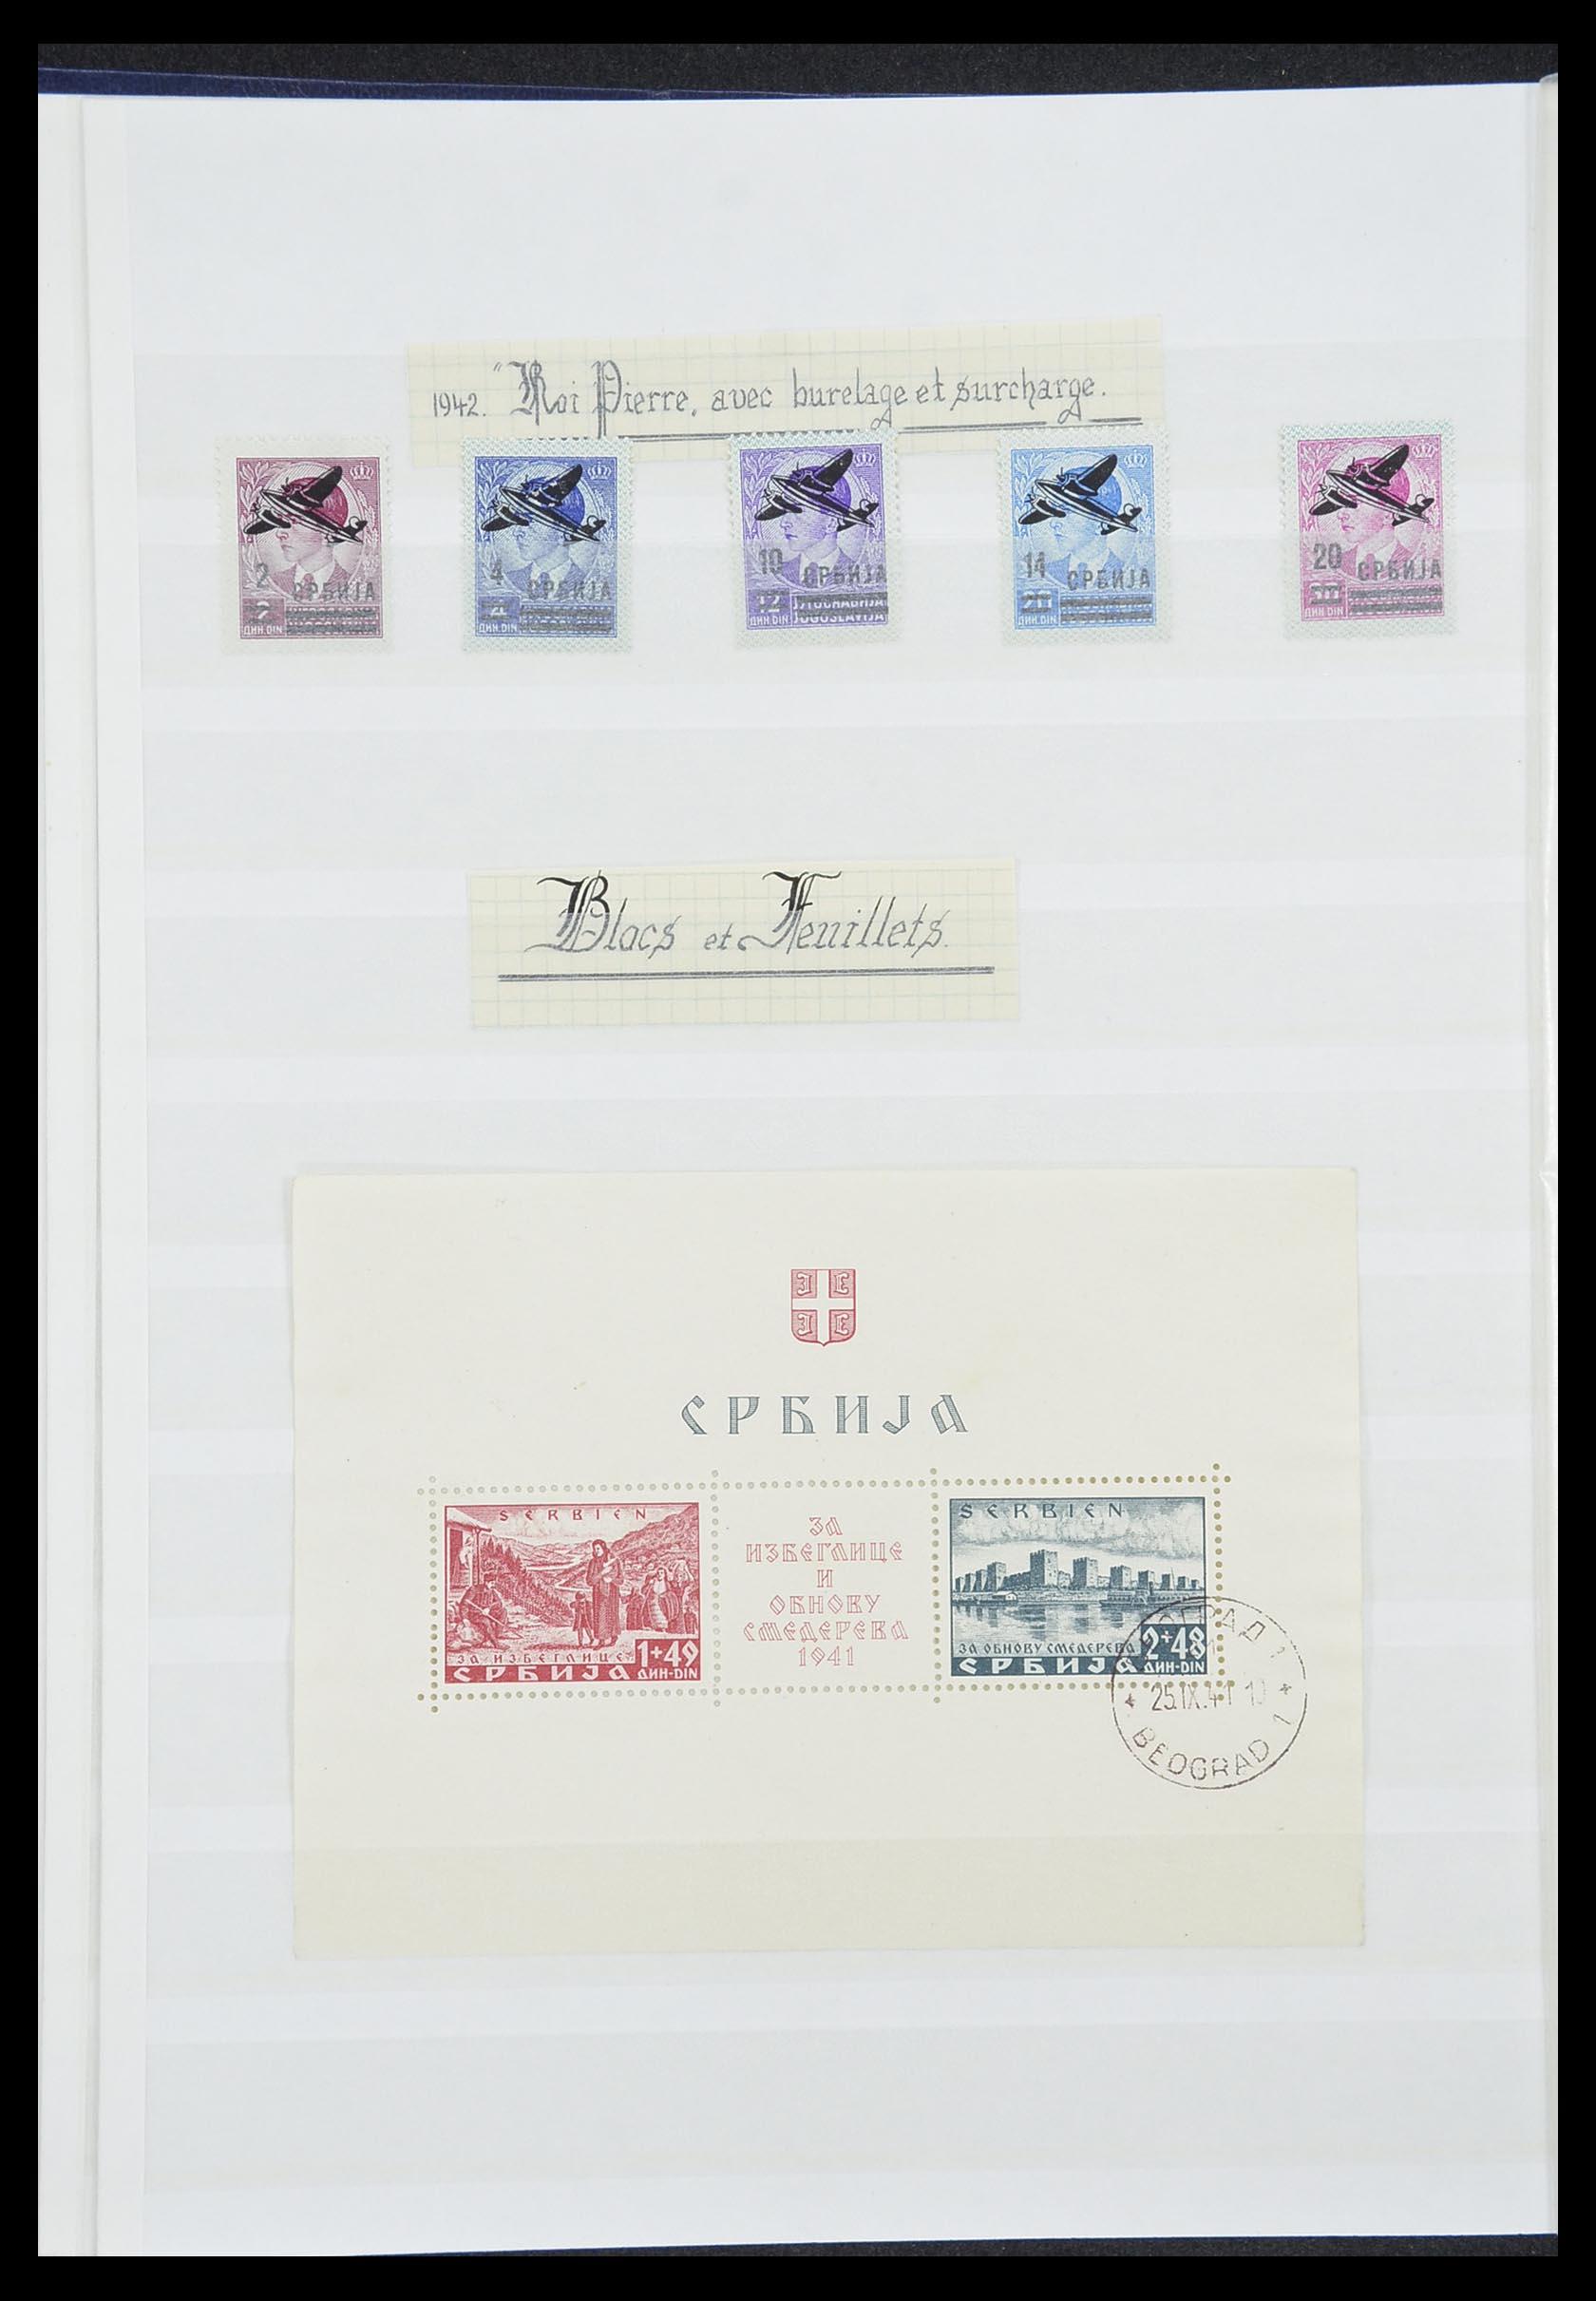 33850 018 - Postzegelverzameling 33850 Duitse bezettingen 2e wereldoorlog 1939-19